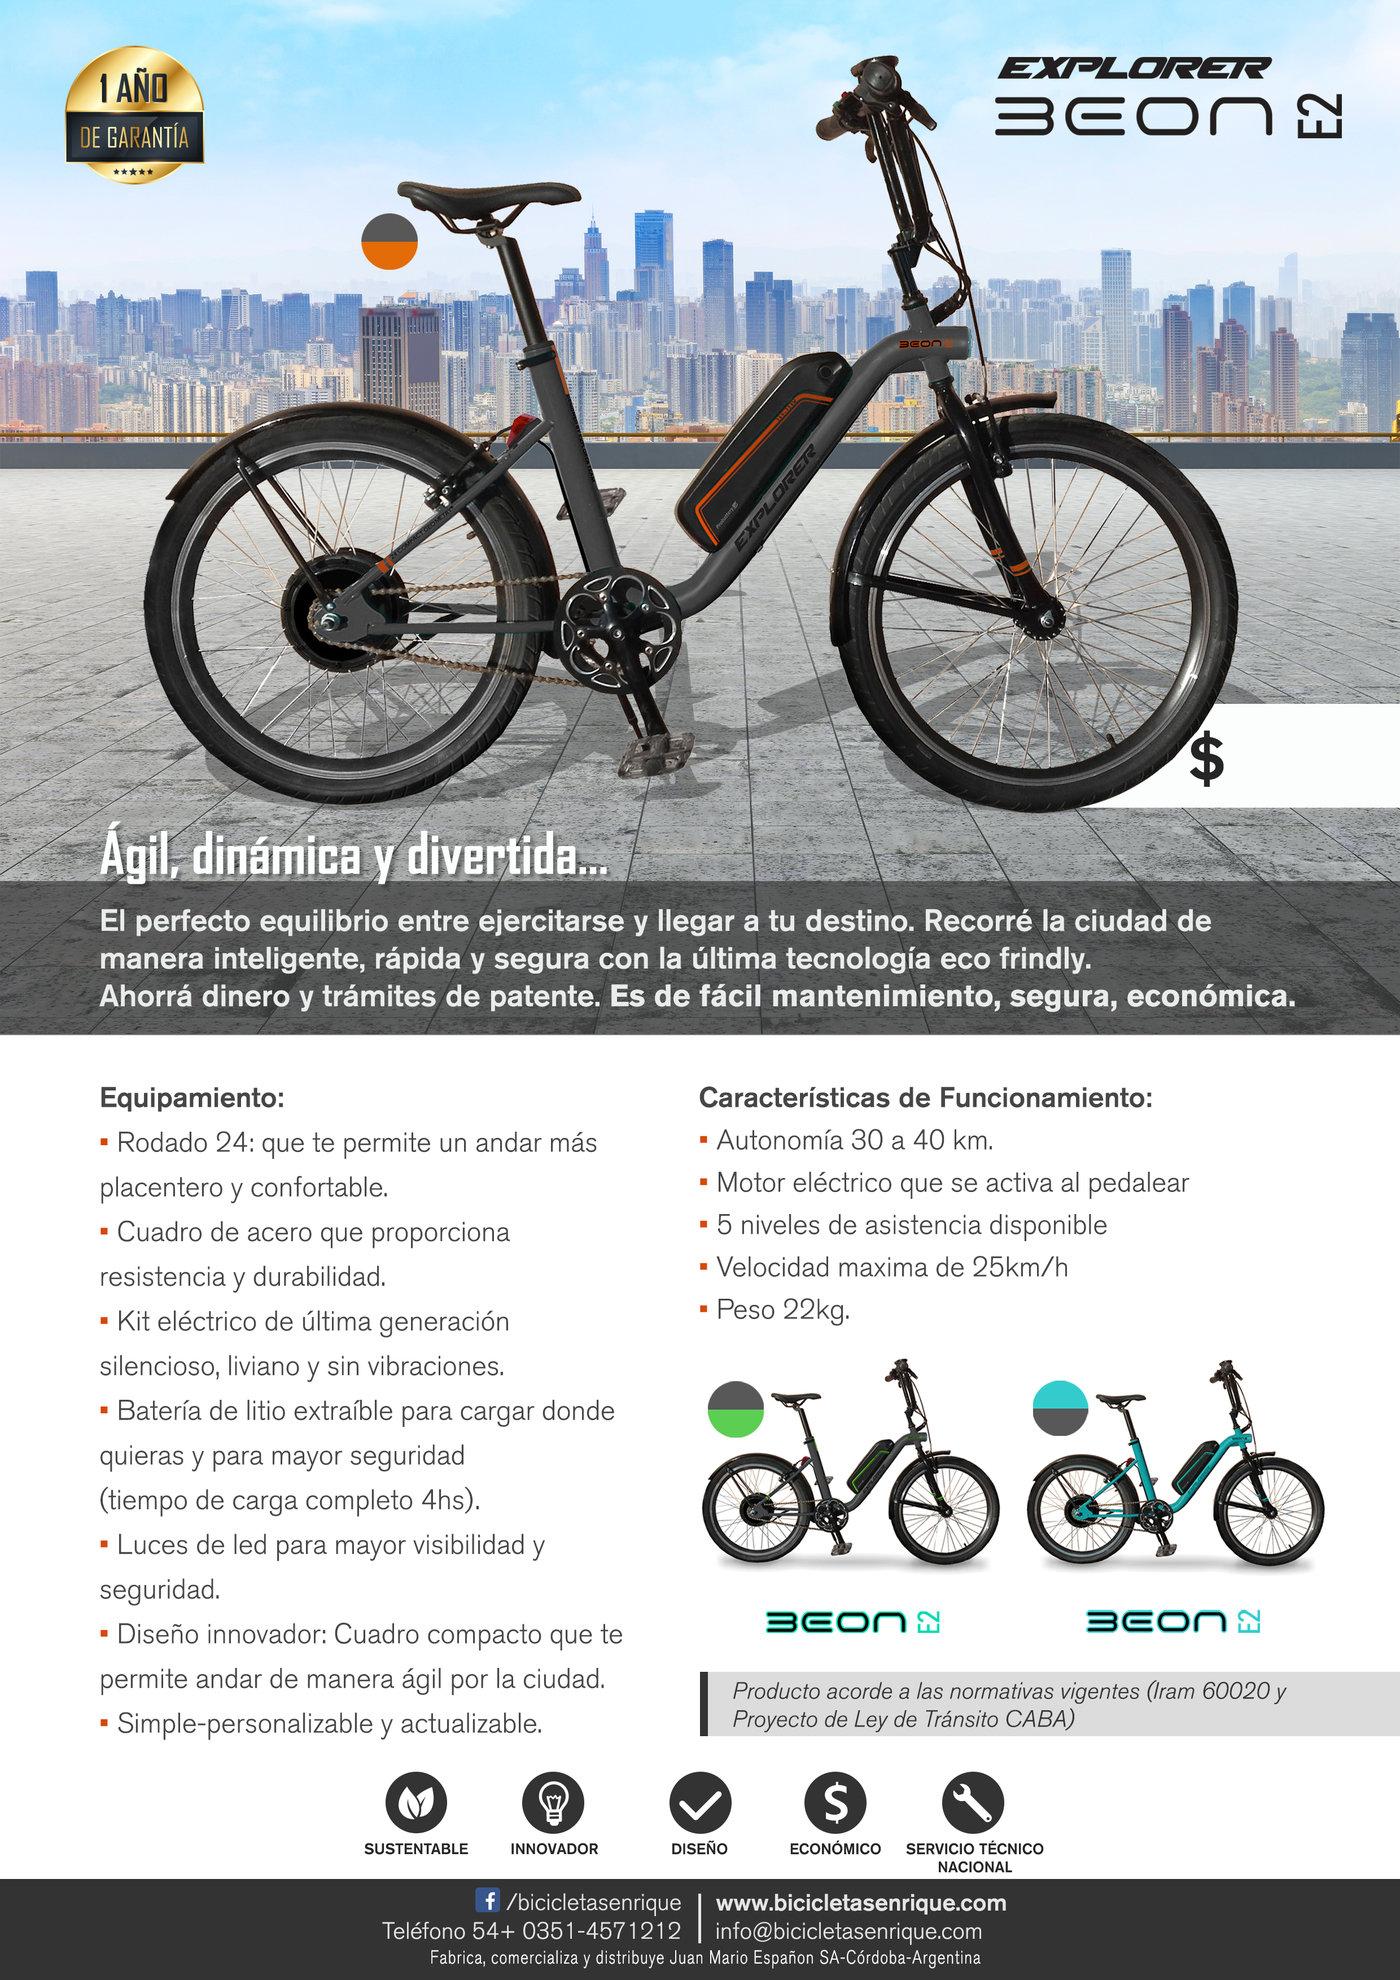 EXPLORER / BEON E2 (E-Bike) / 2017 by Carlos Serra at